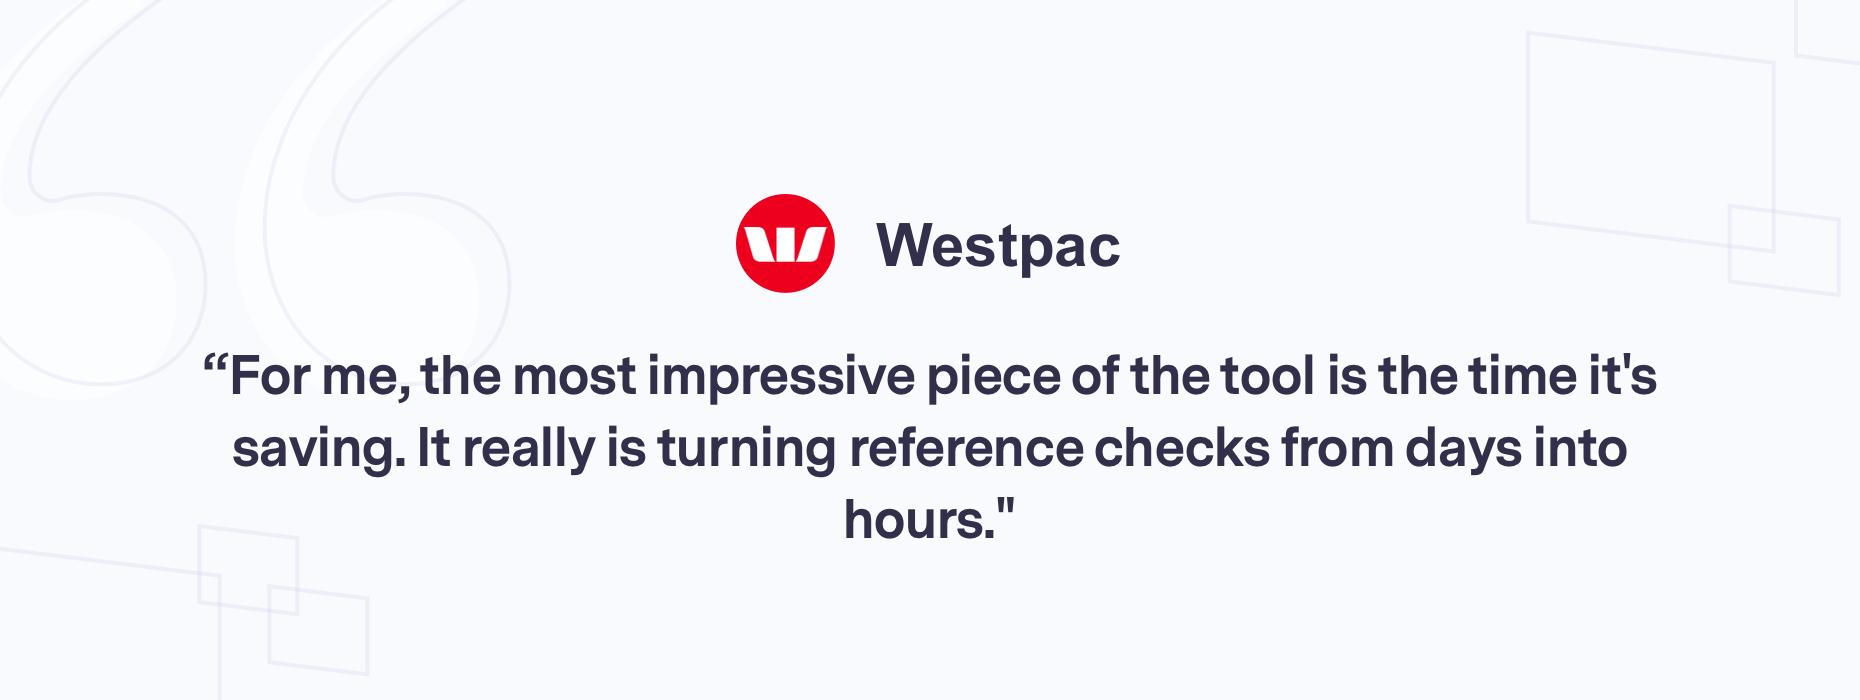 Customer quote Westpac